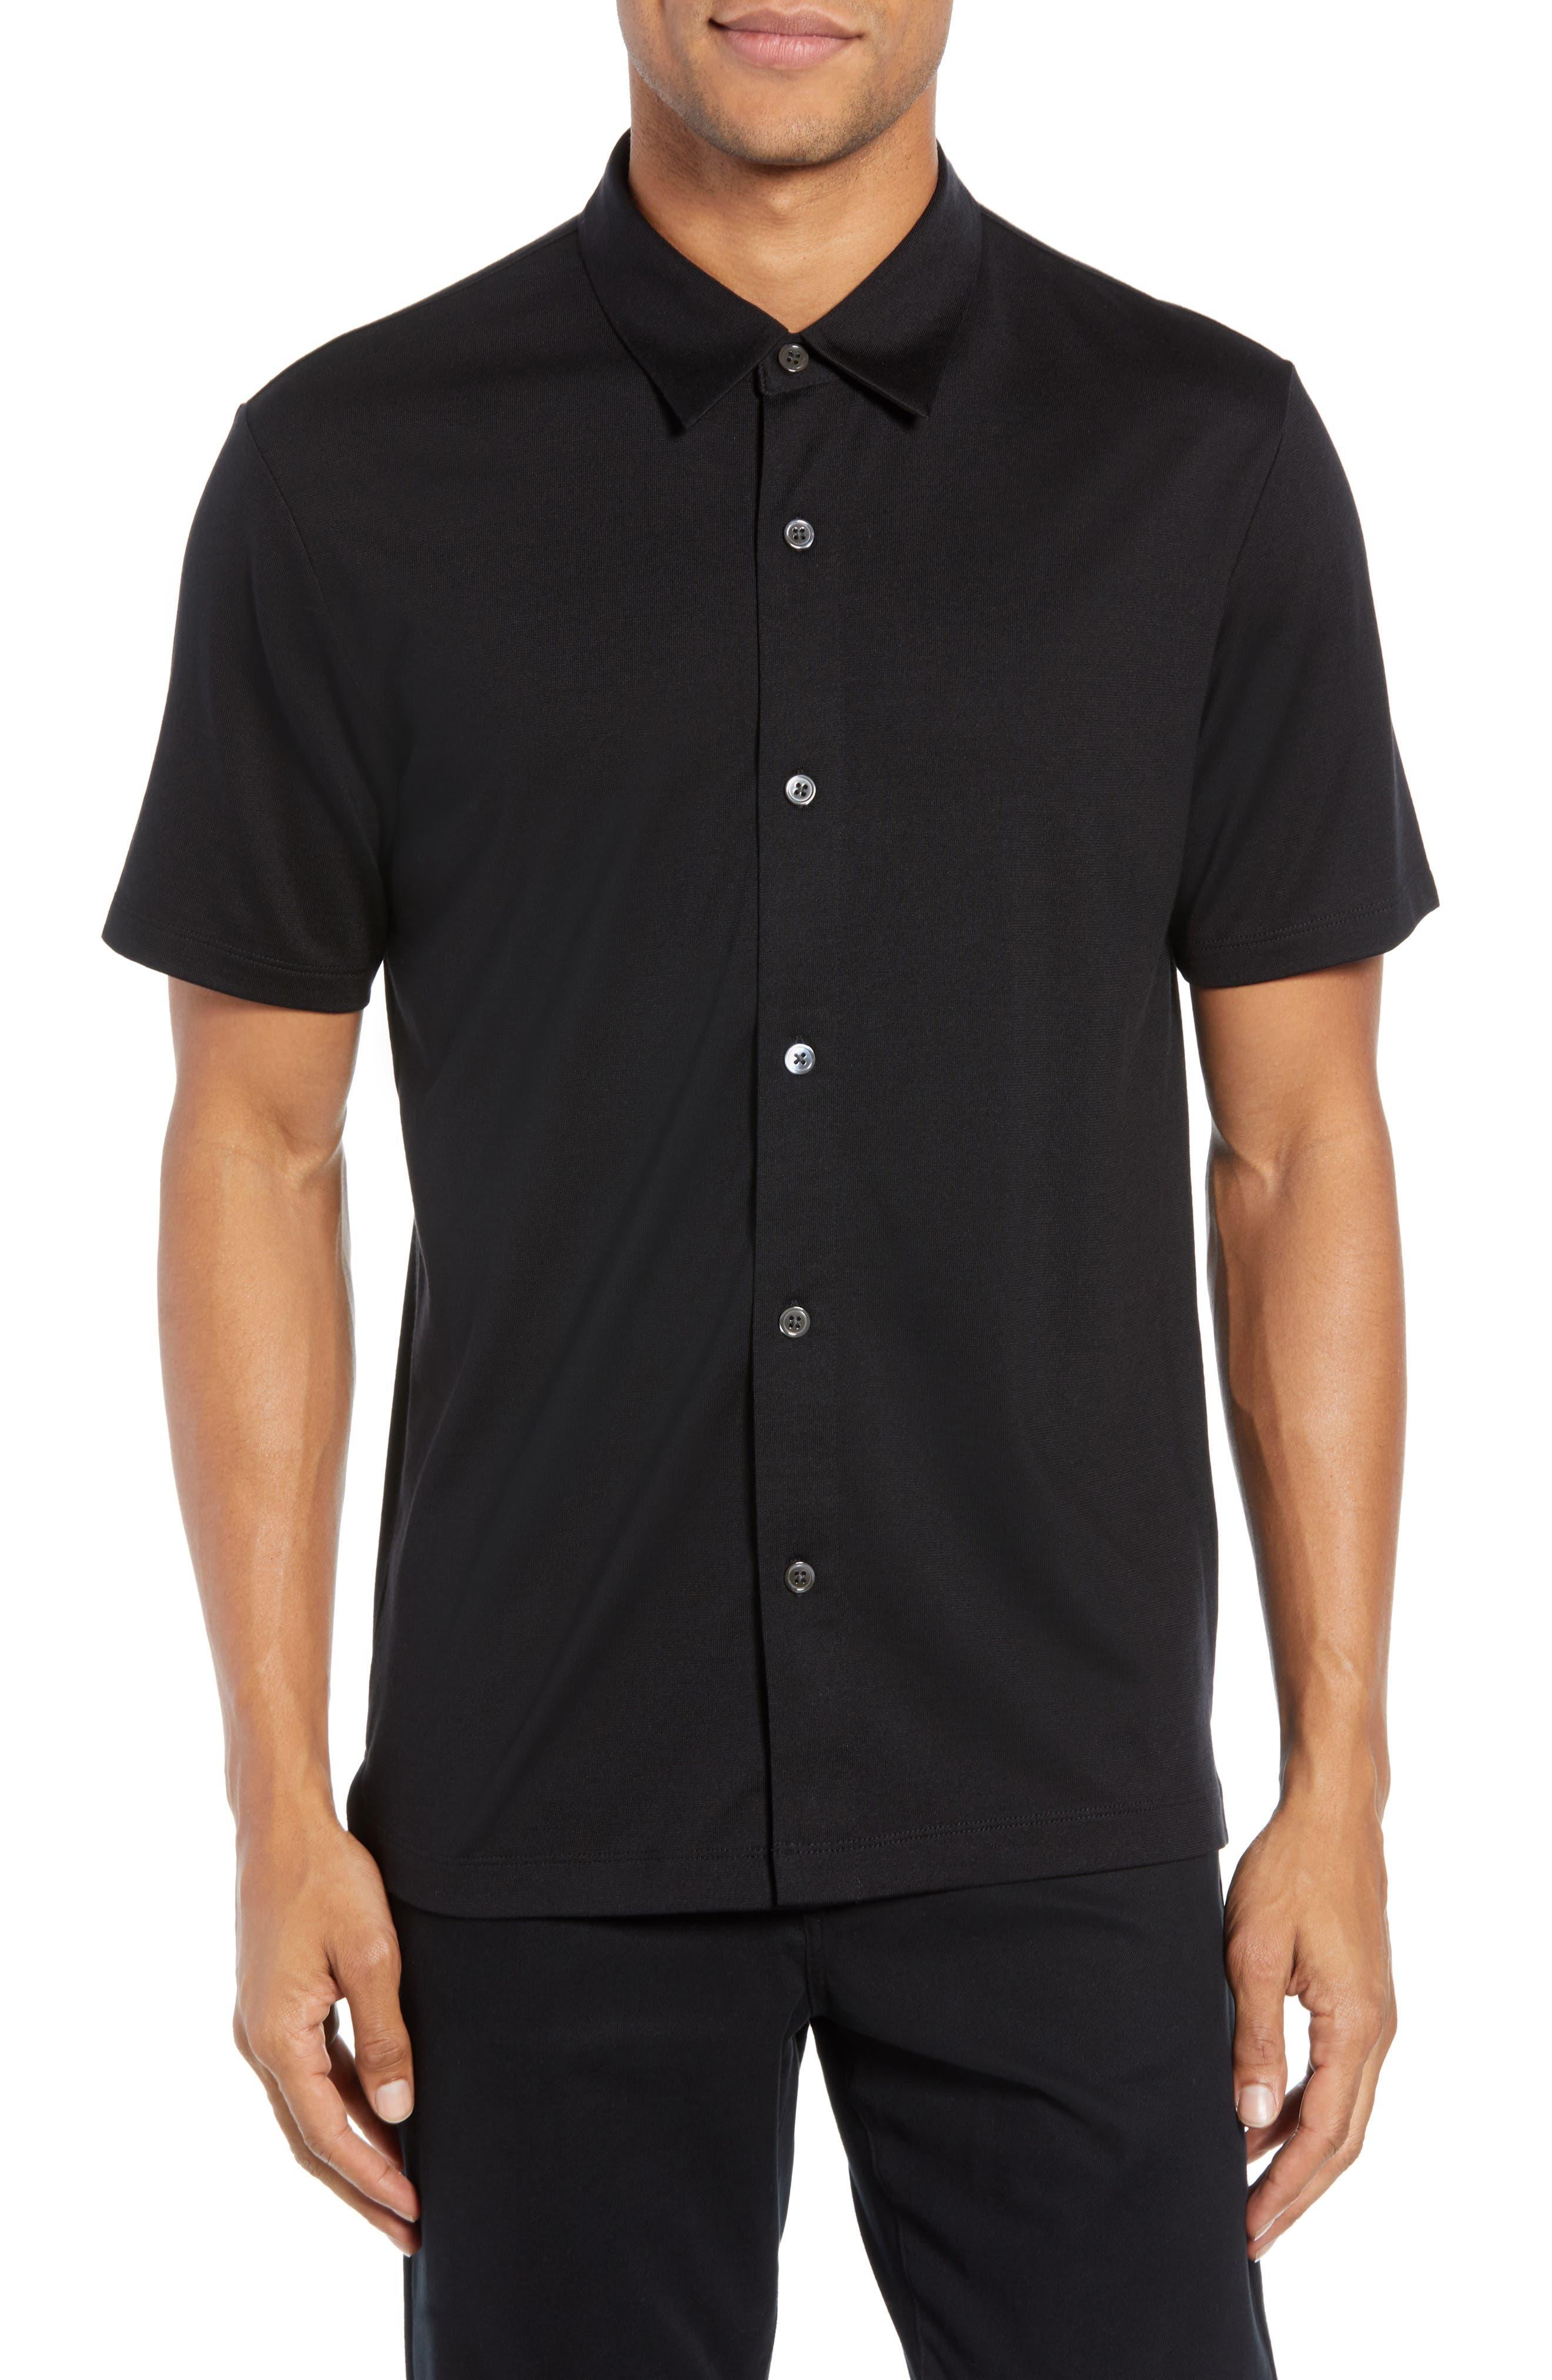 Incisi Slim Fit Knit Silk Blend Shirt,                             Main thumbnail 1, color,                             BLACK